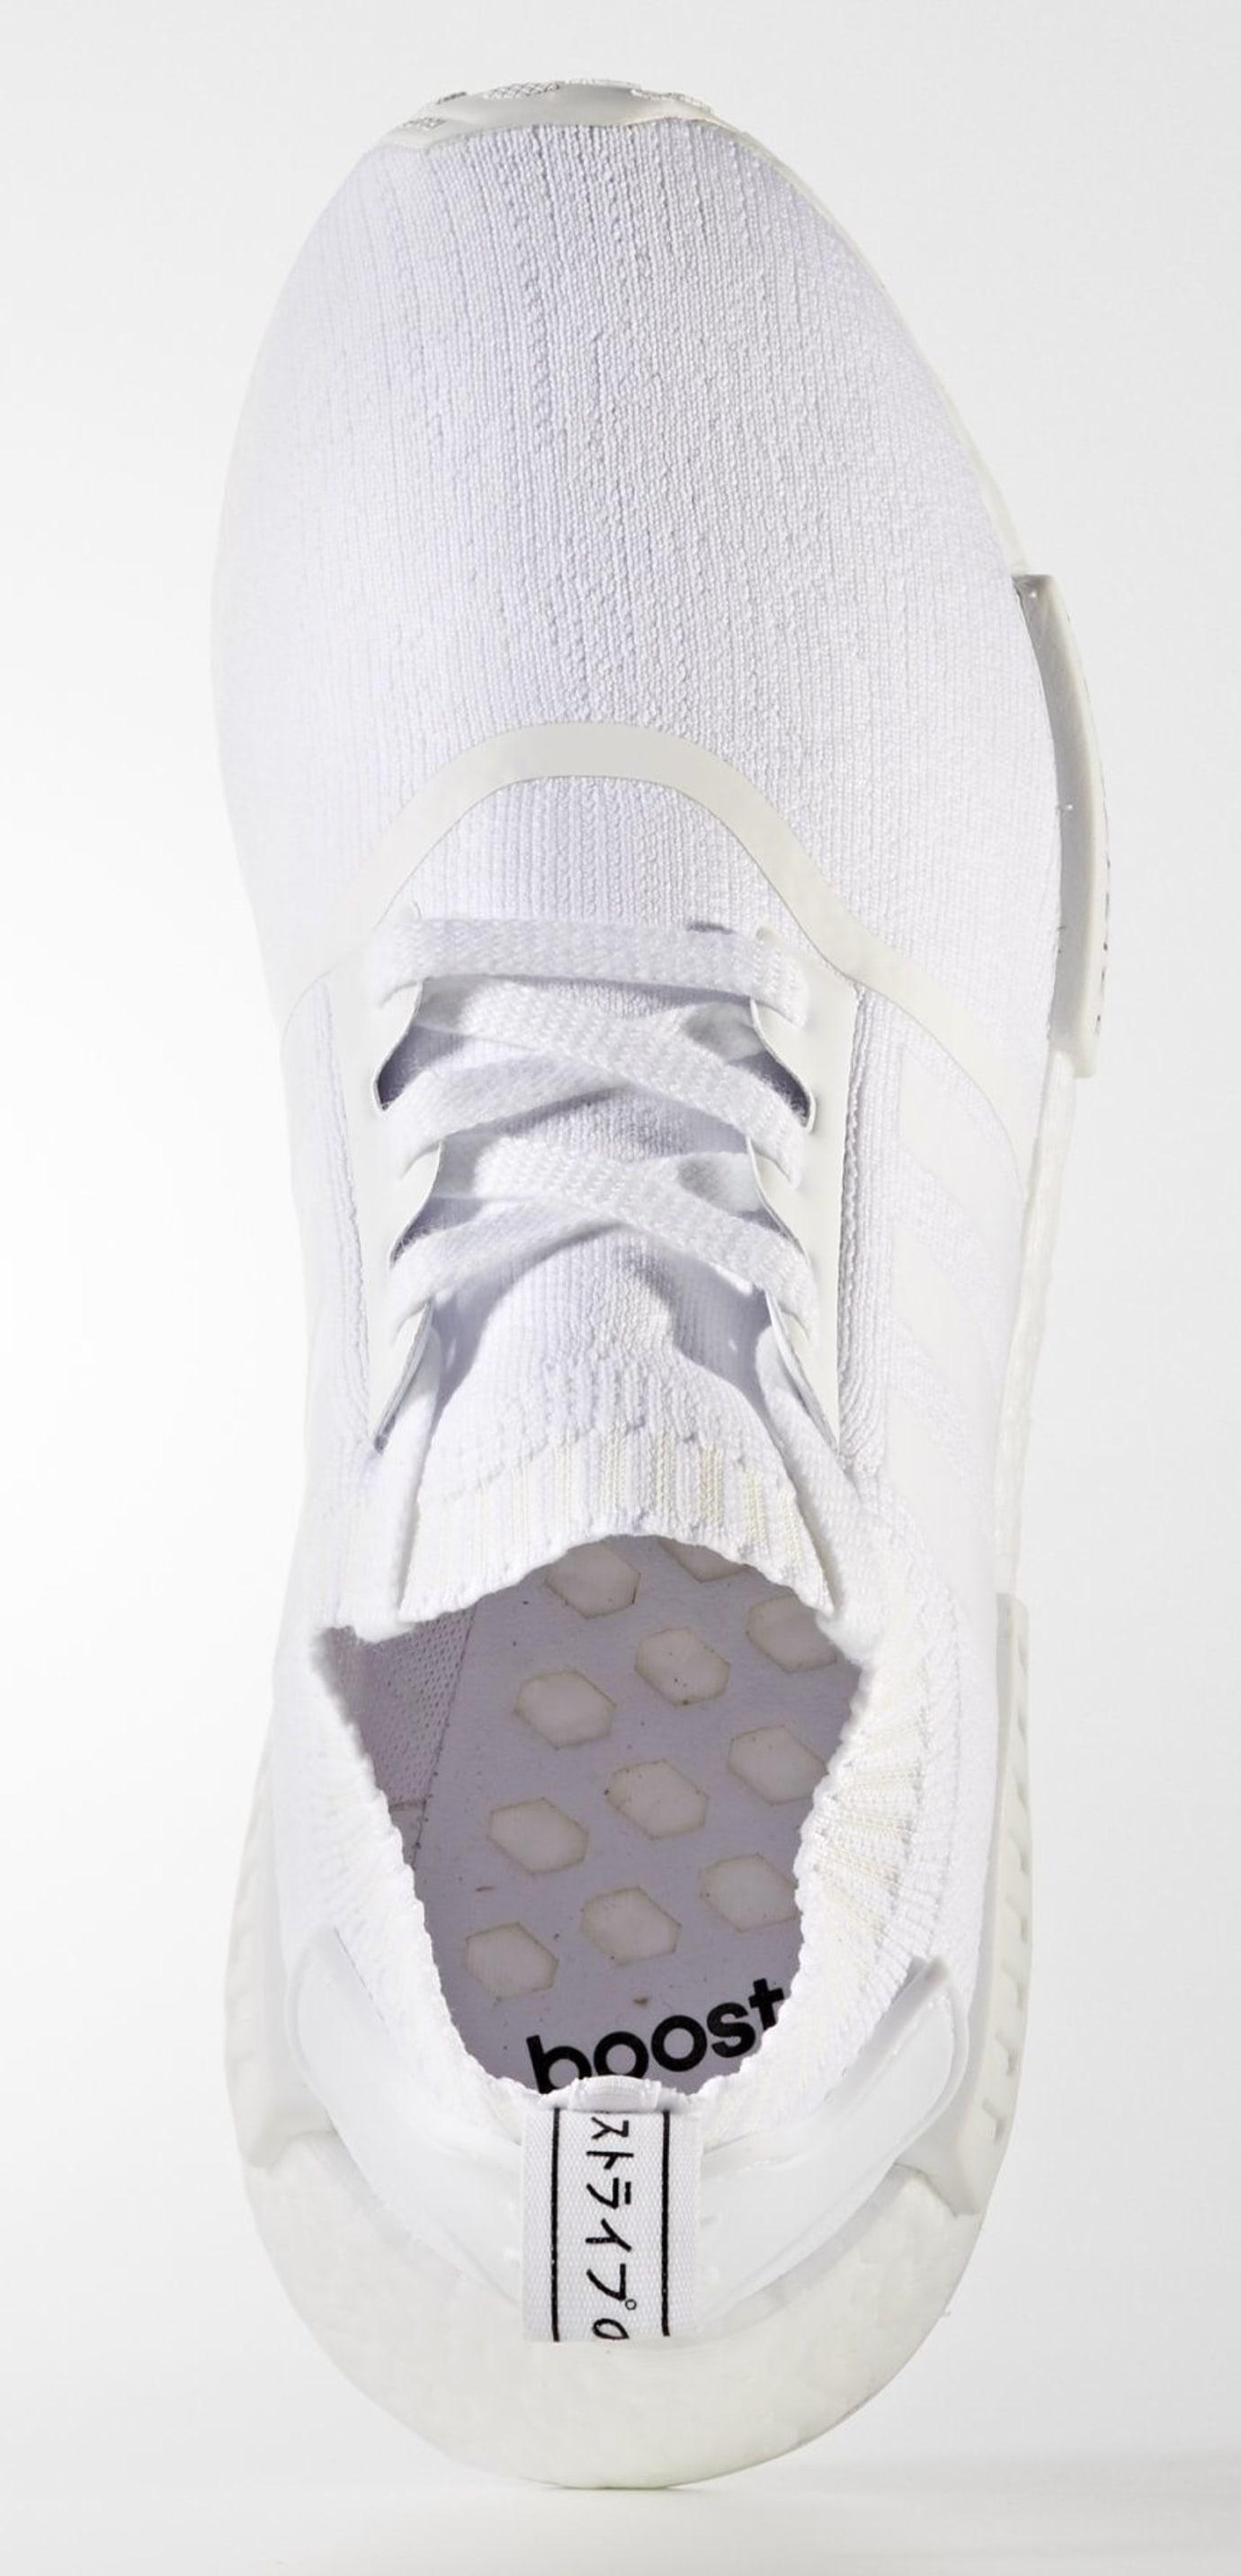 Adidas NMD_R1 PK 'Japan Pack' BZ0221 (Top)